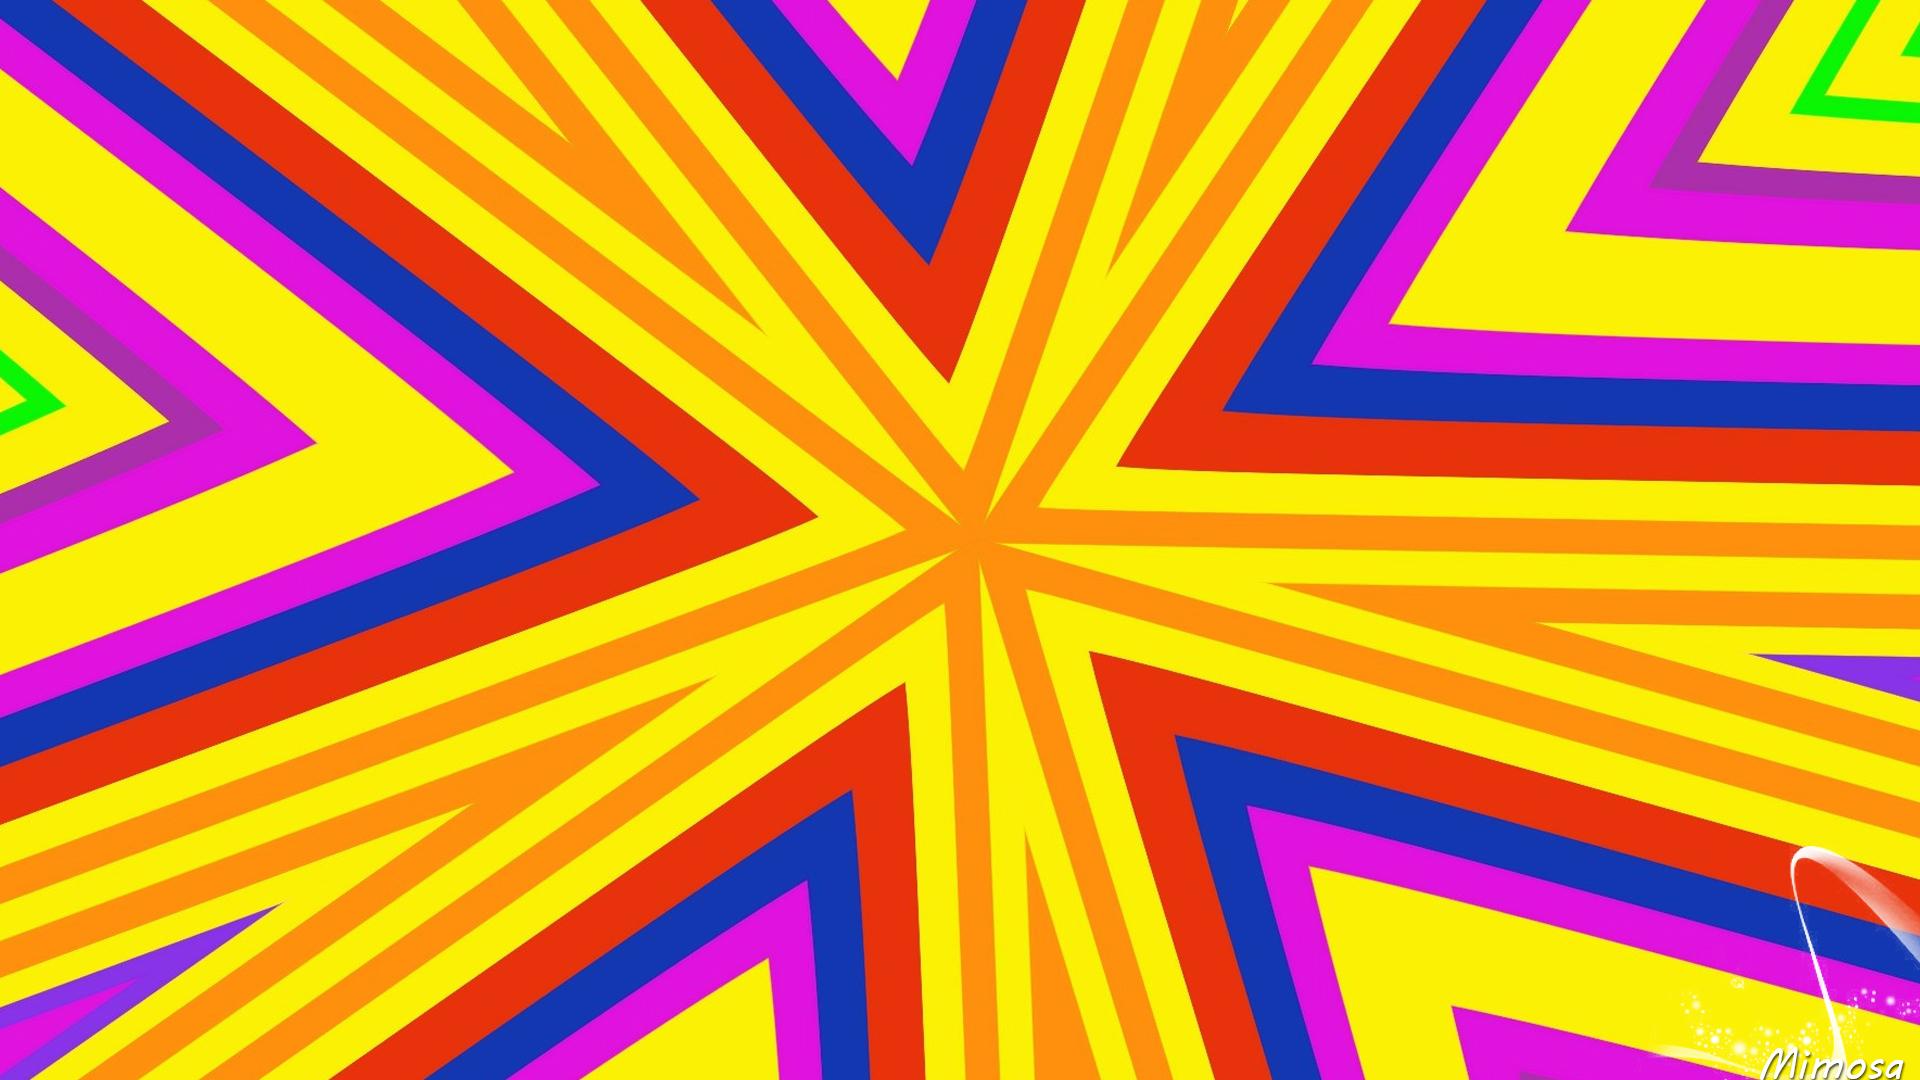 Artistic Digital Art Colors Pattern Yellow Orange Color 1920x1080